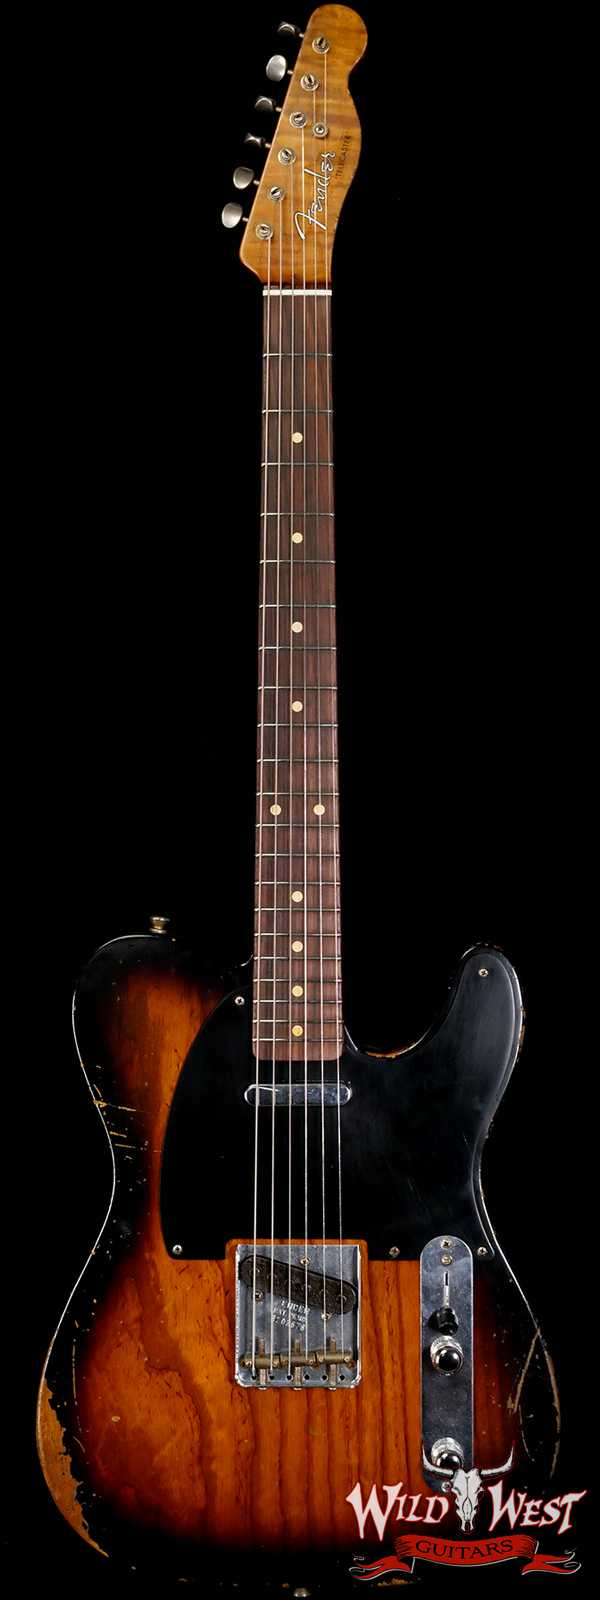 Fender Custom Shop Ron Thorn Masterbuilt 1952 Telecaster Relic Ash Body Rosewood Fingerboard 2 Tone Sunburst 6.65 LBS